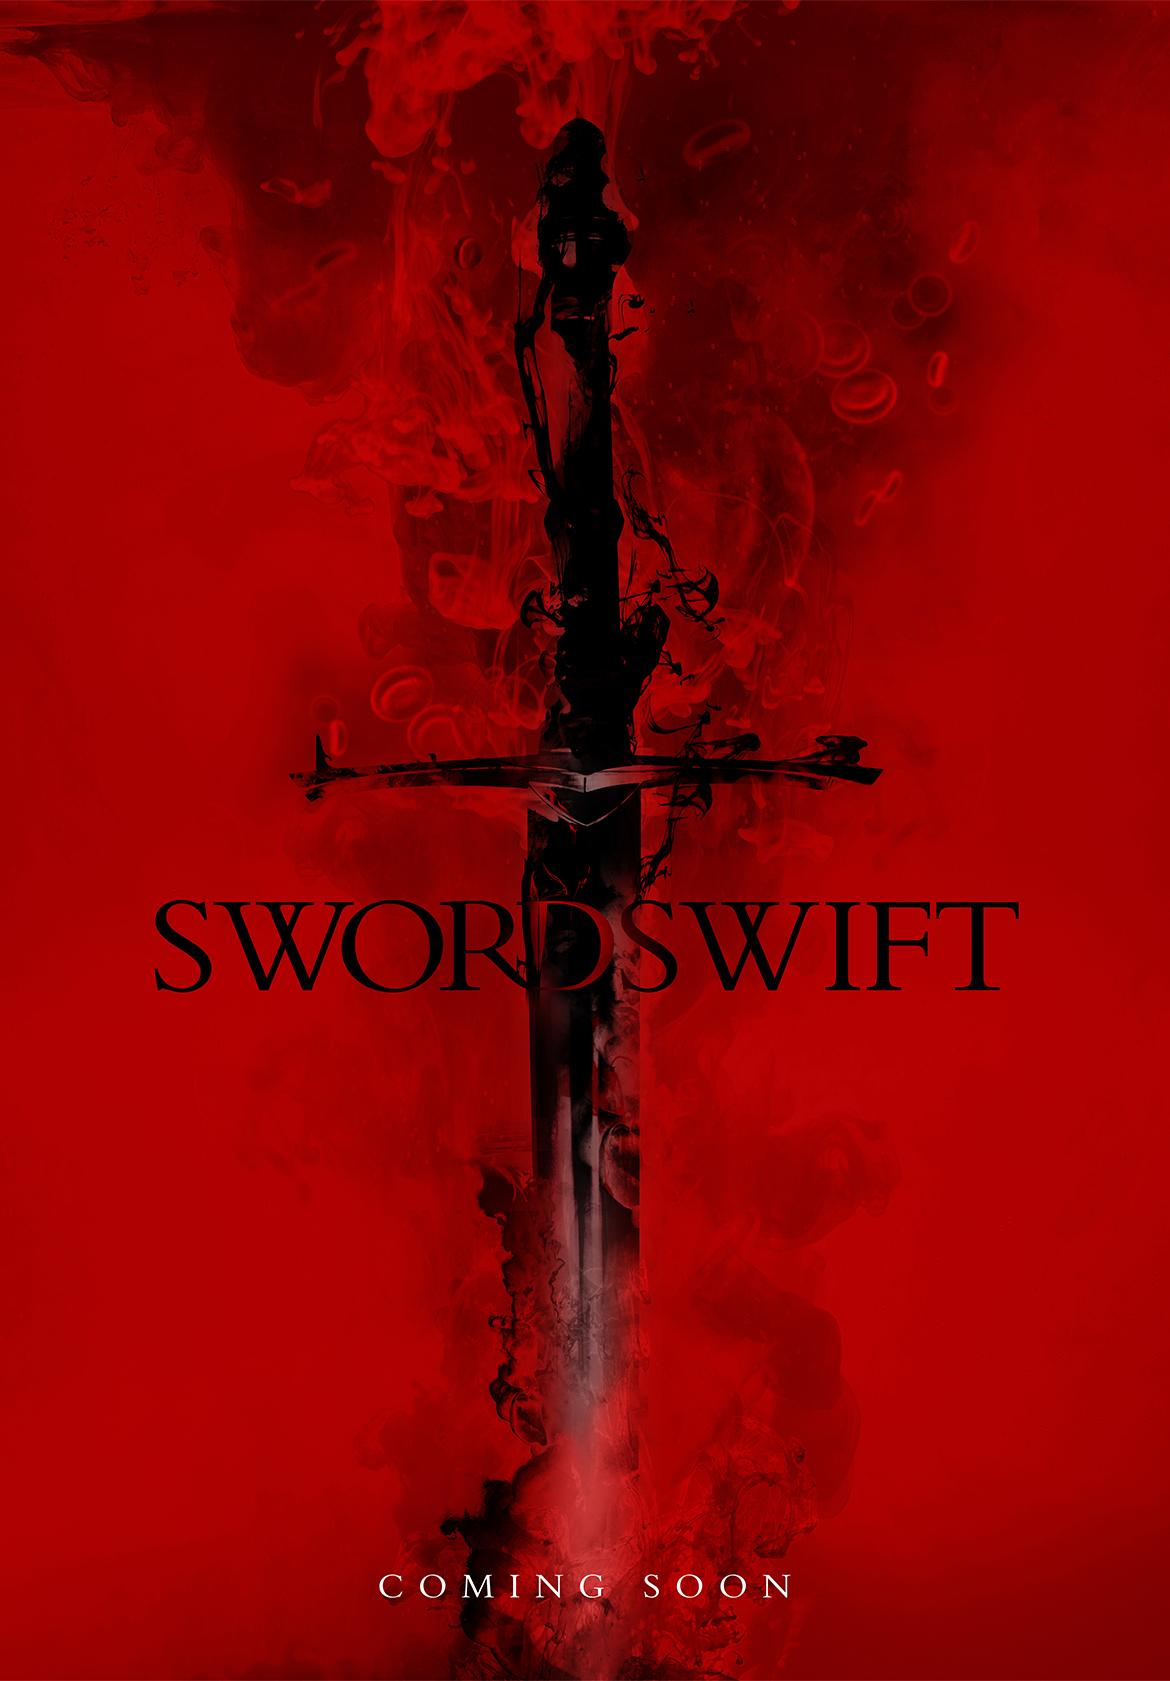 Swordswift_Key_Art.jpg